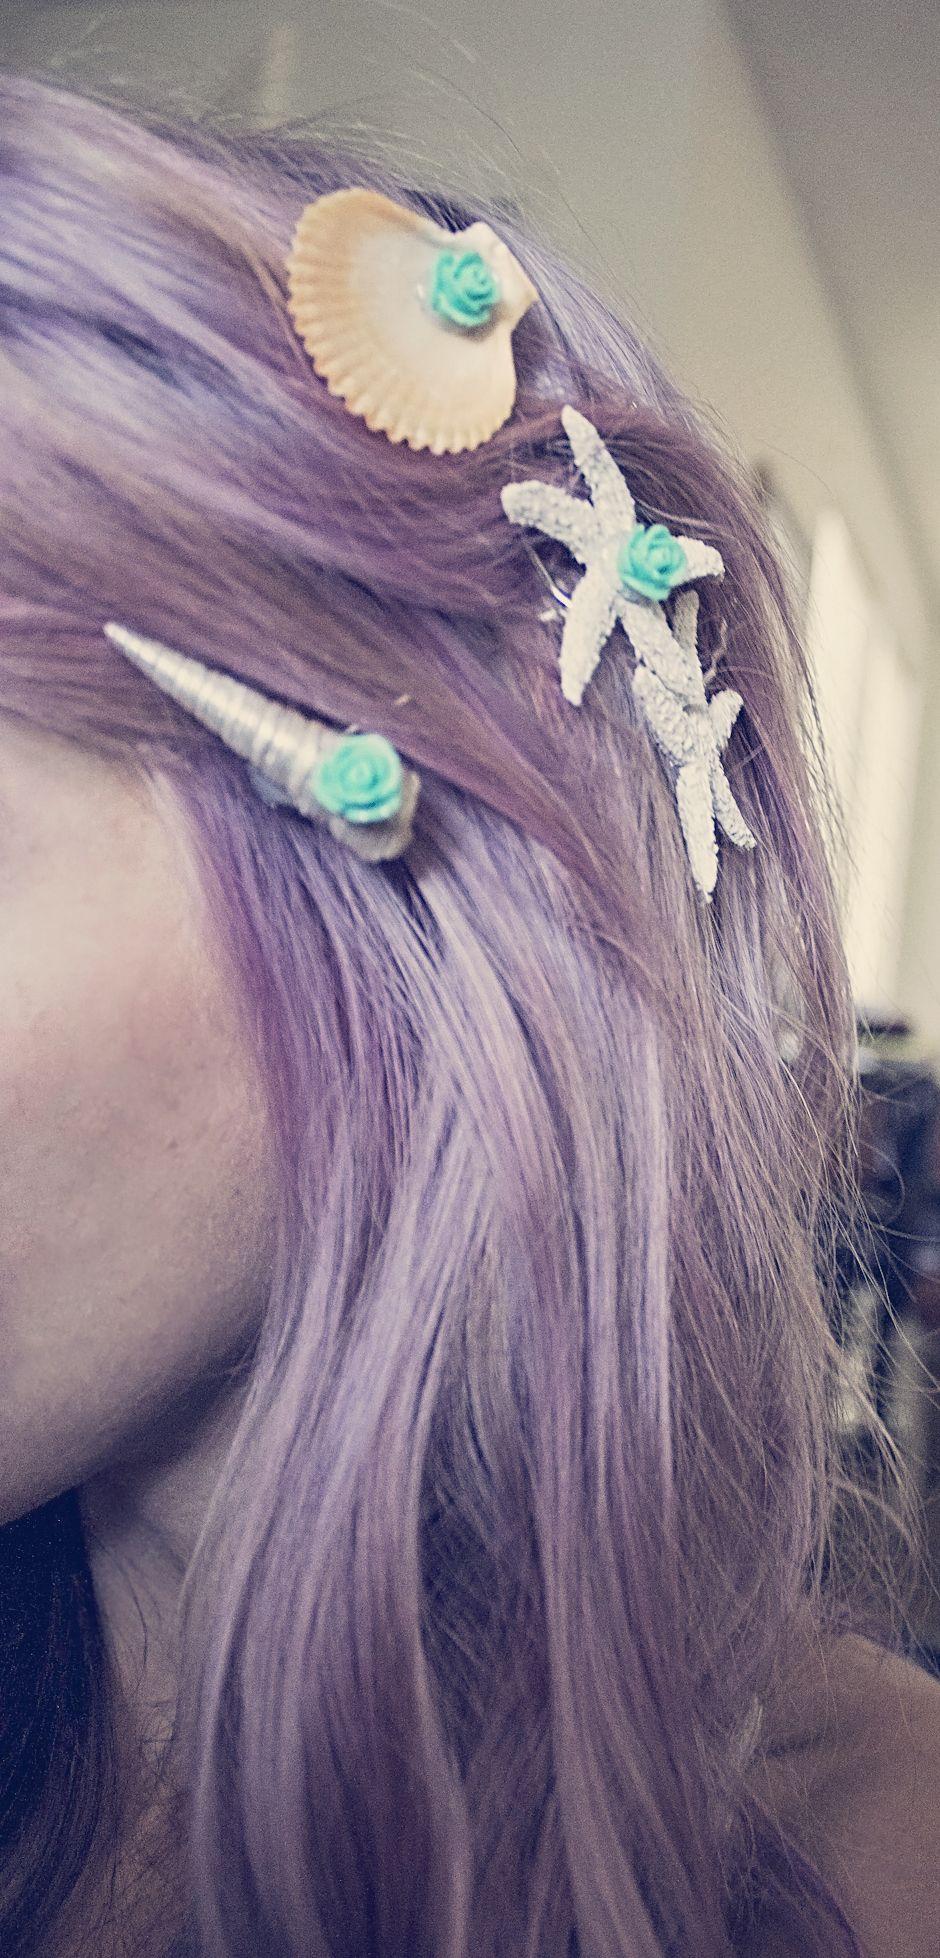 Hair clips mermaid seashells diy crafts do it yourself diy hair clips mermaid seashells diy crafts do it yourself solutioingenieria Gallery